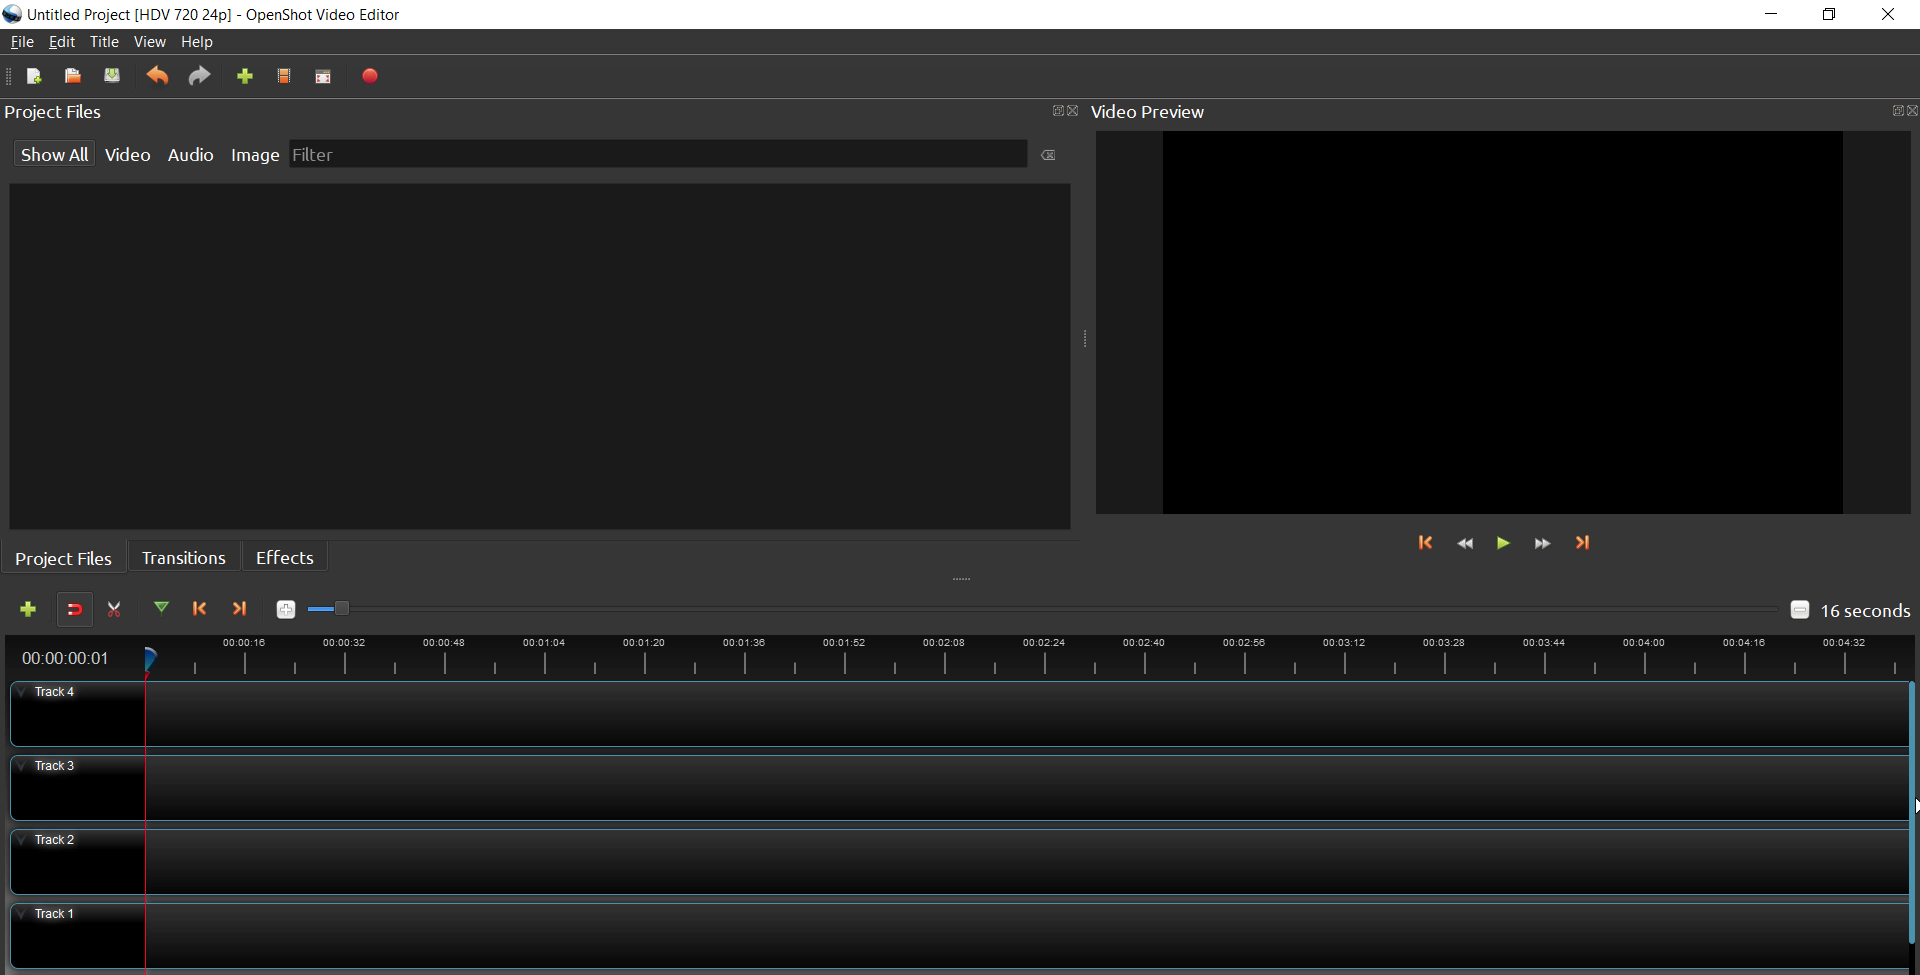 Free Video Editing Software for Animators - [Helpful Tutorial]